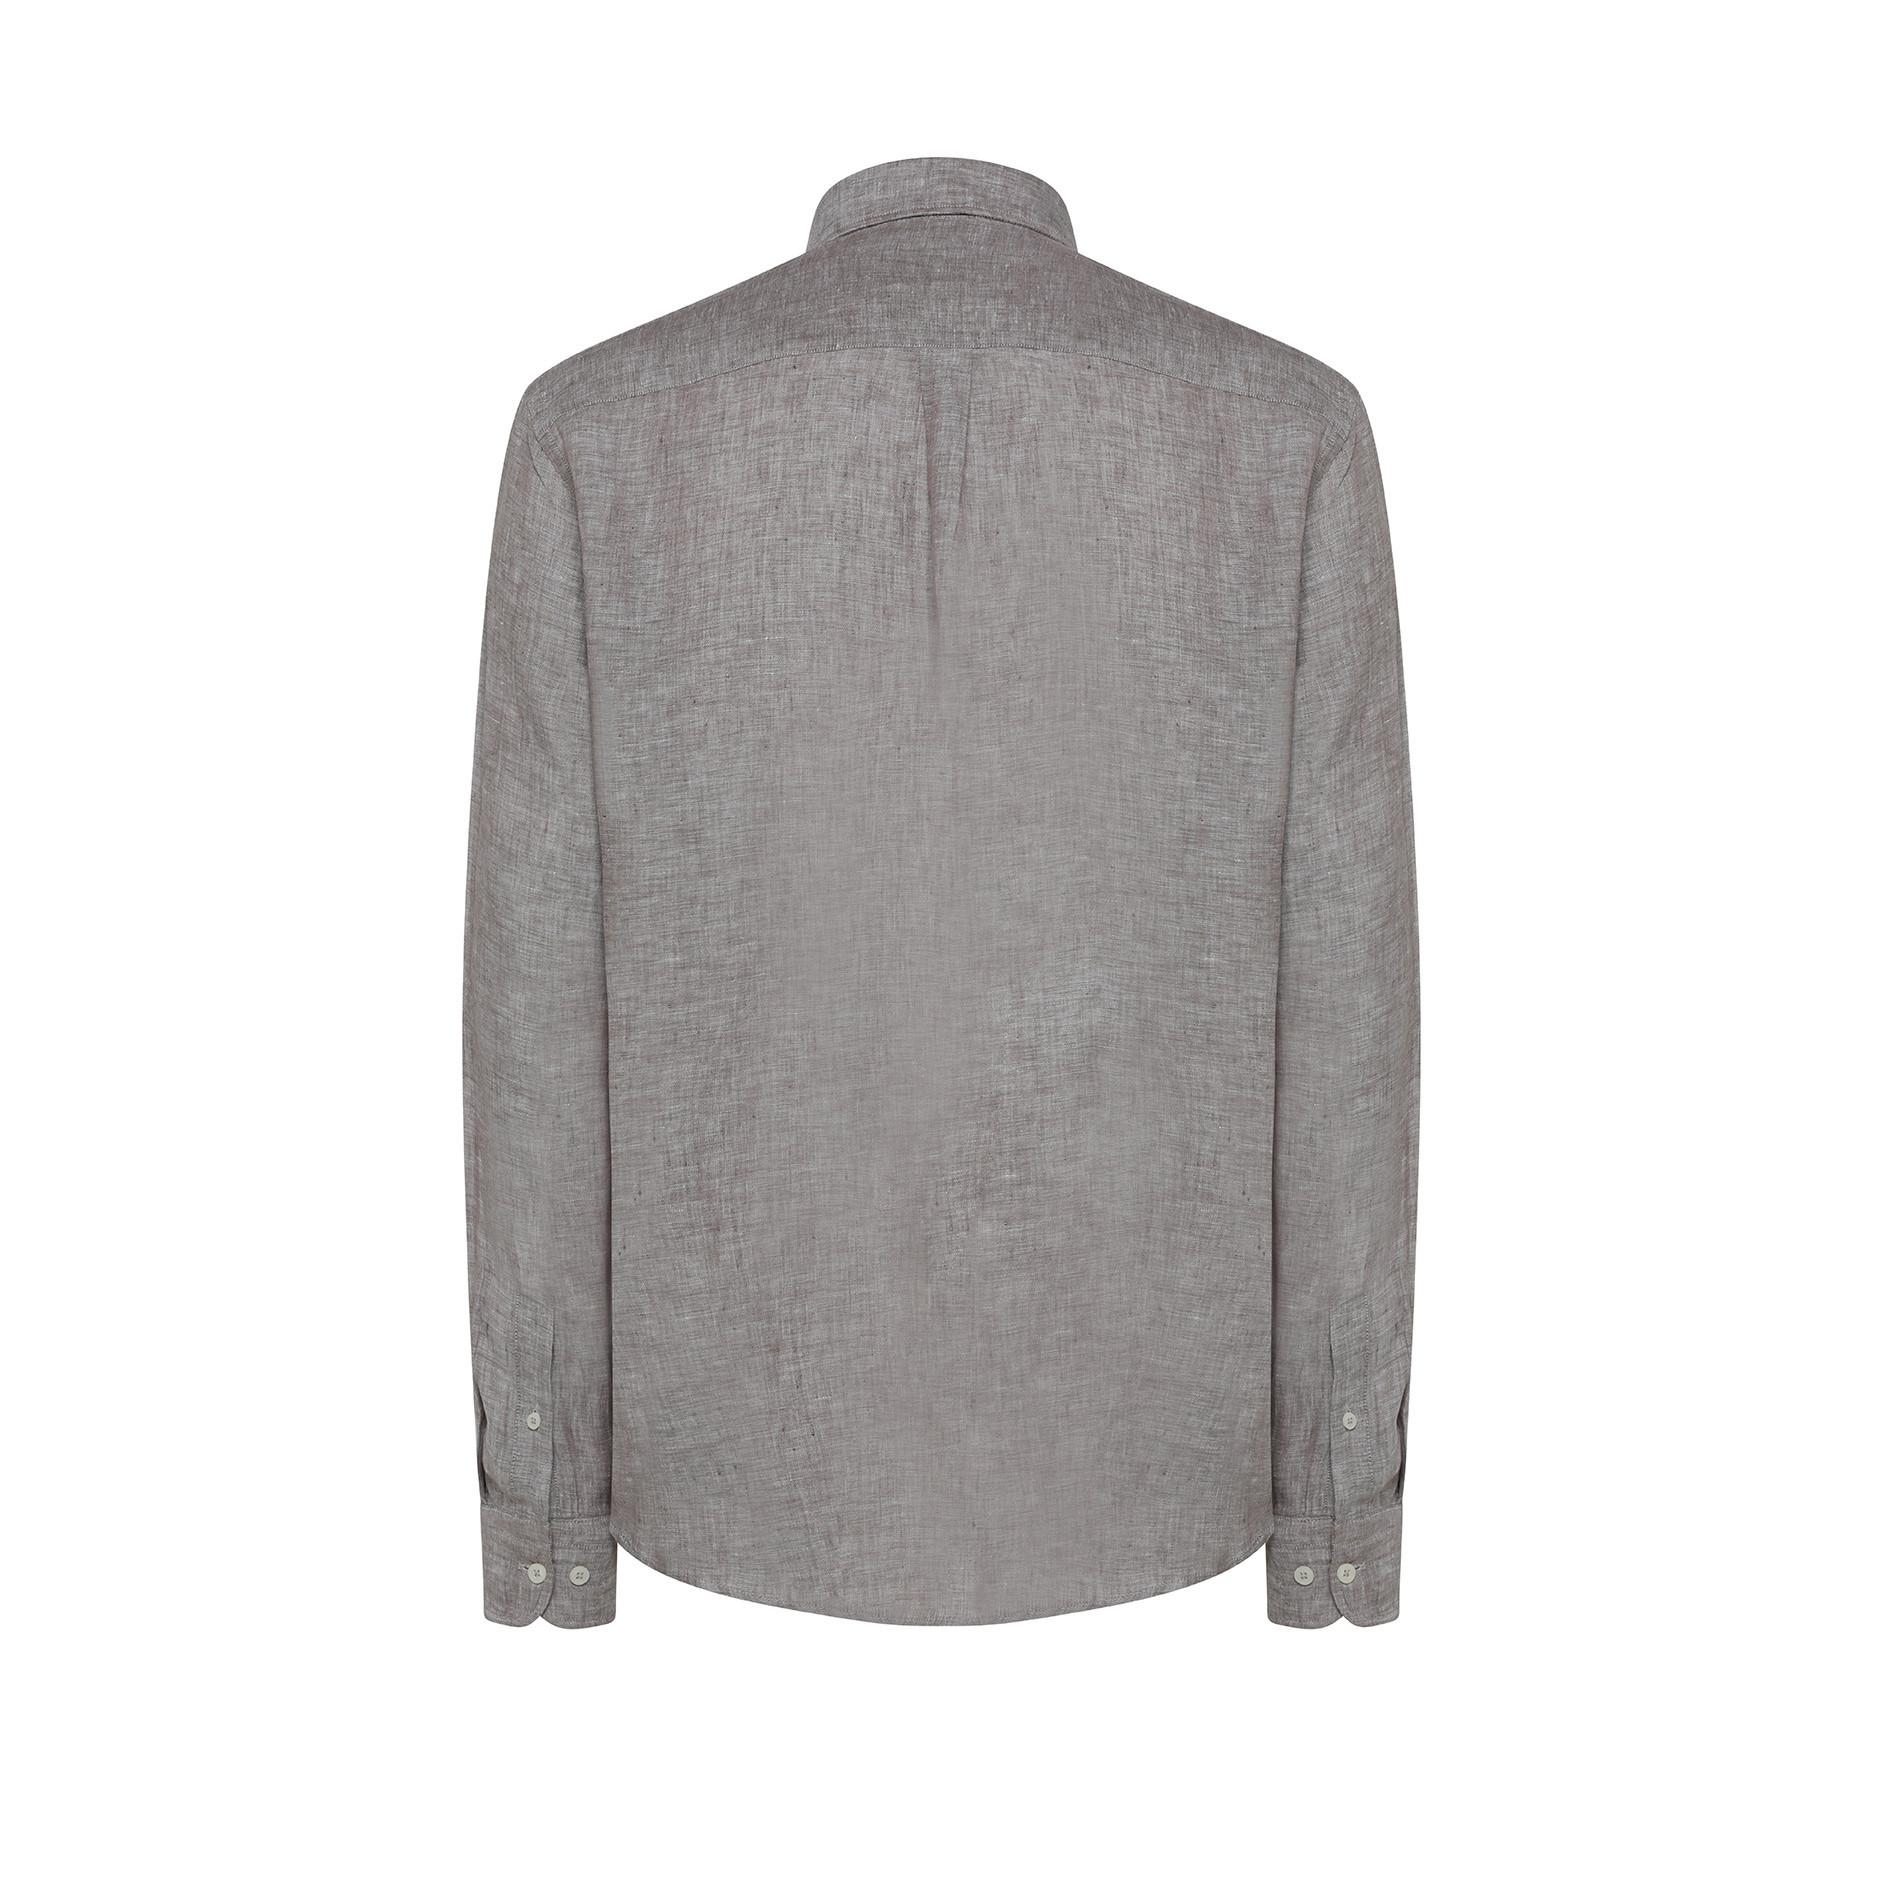 Camicia puro lino regular fit Luca D'Altieri, Marrone chiaro, large image number 1